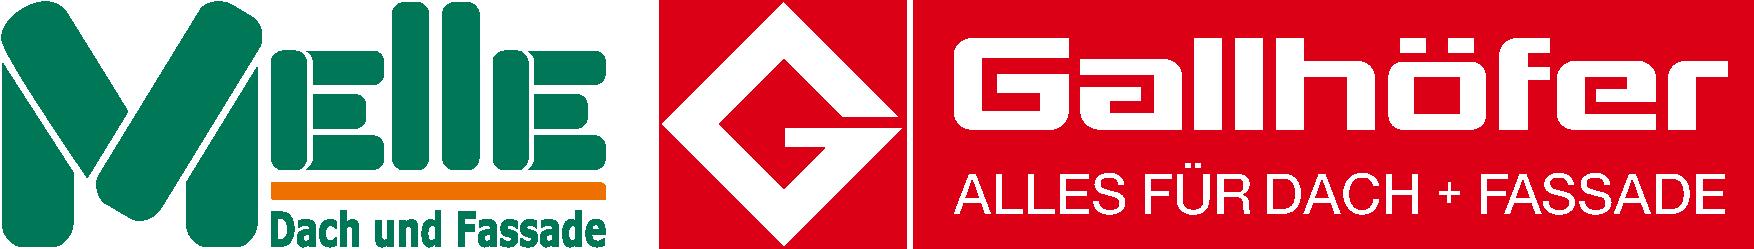 Melle Gallhöfer Dach GmbH Logo